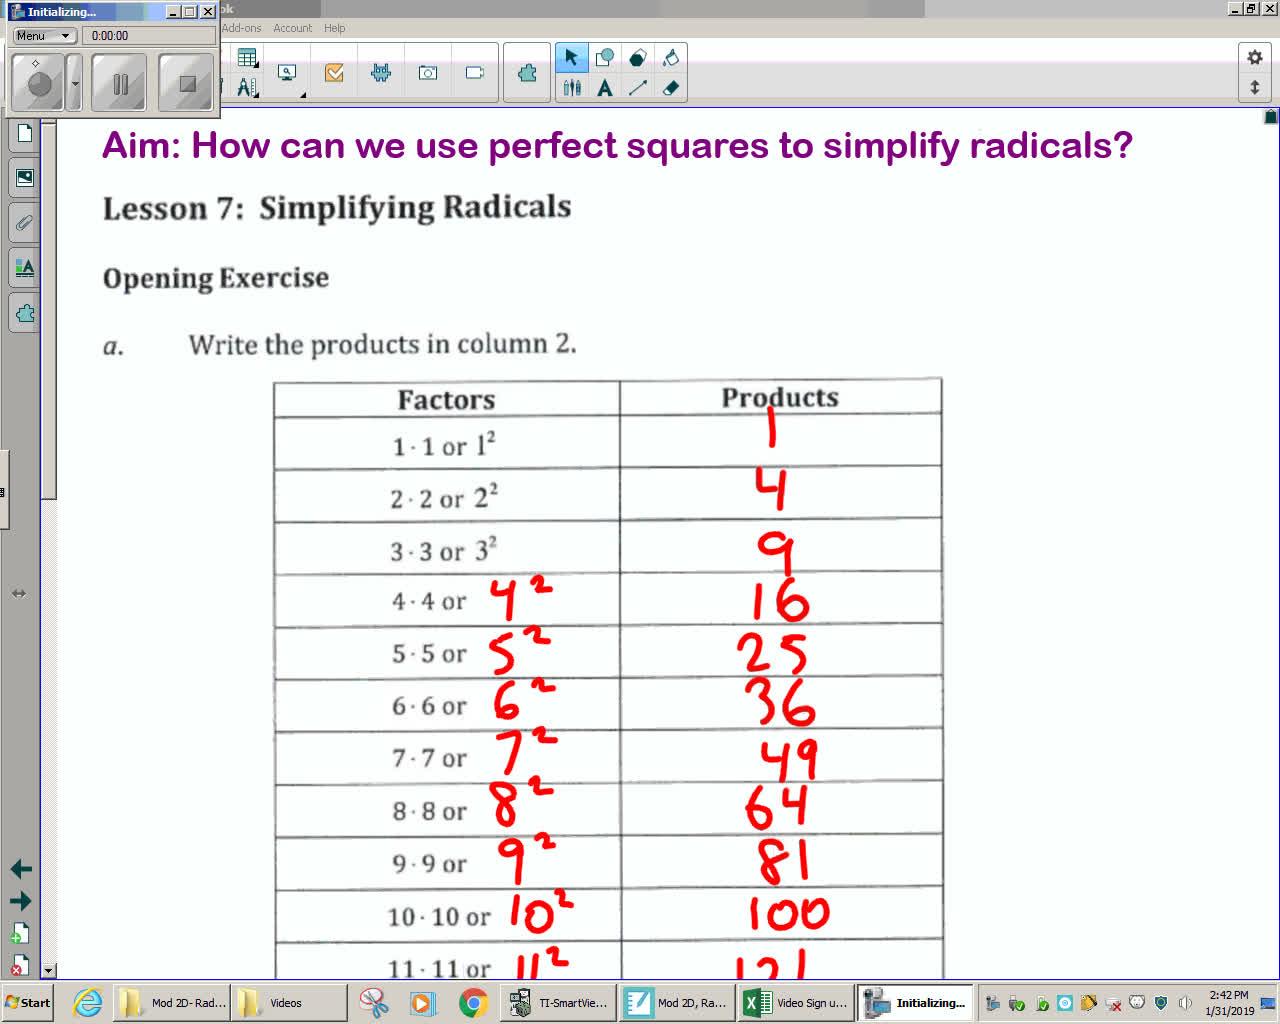 Module 2E Unit 6 Lesson 7